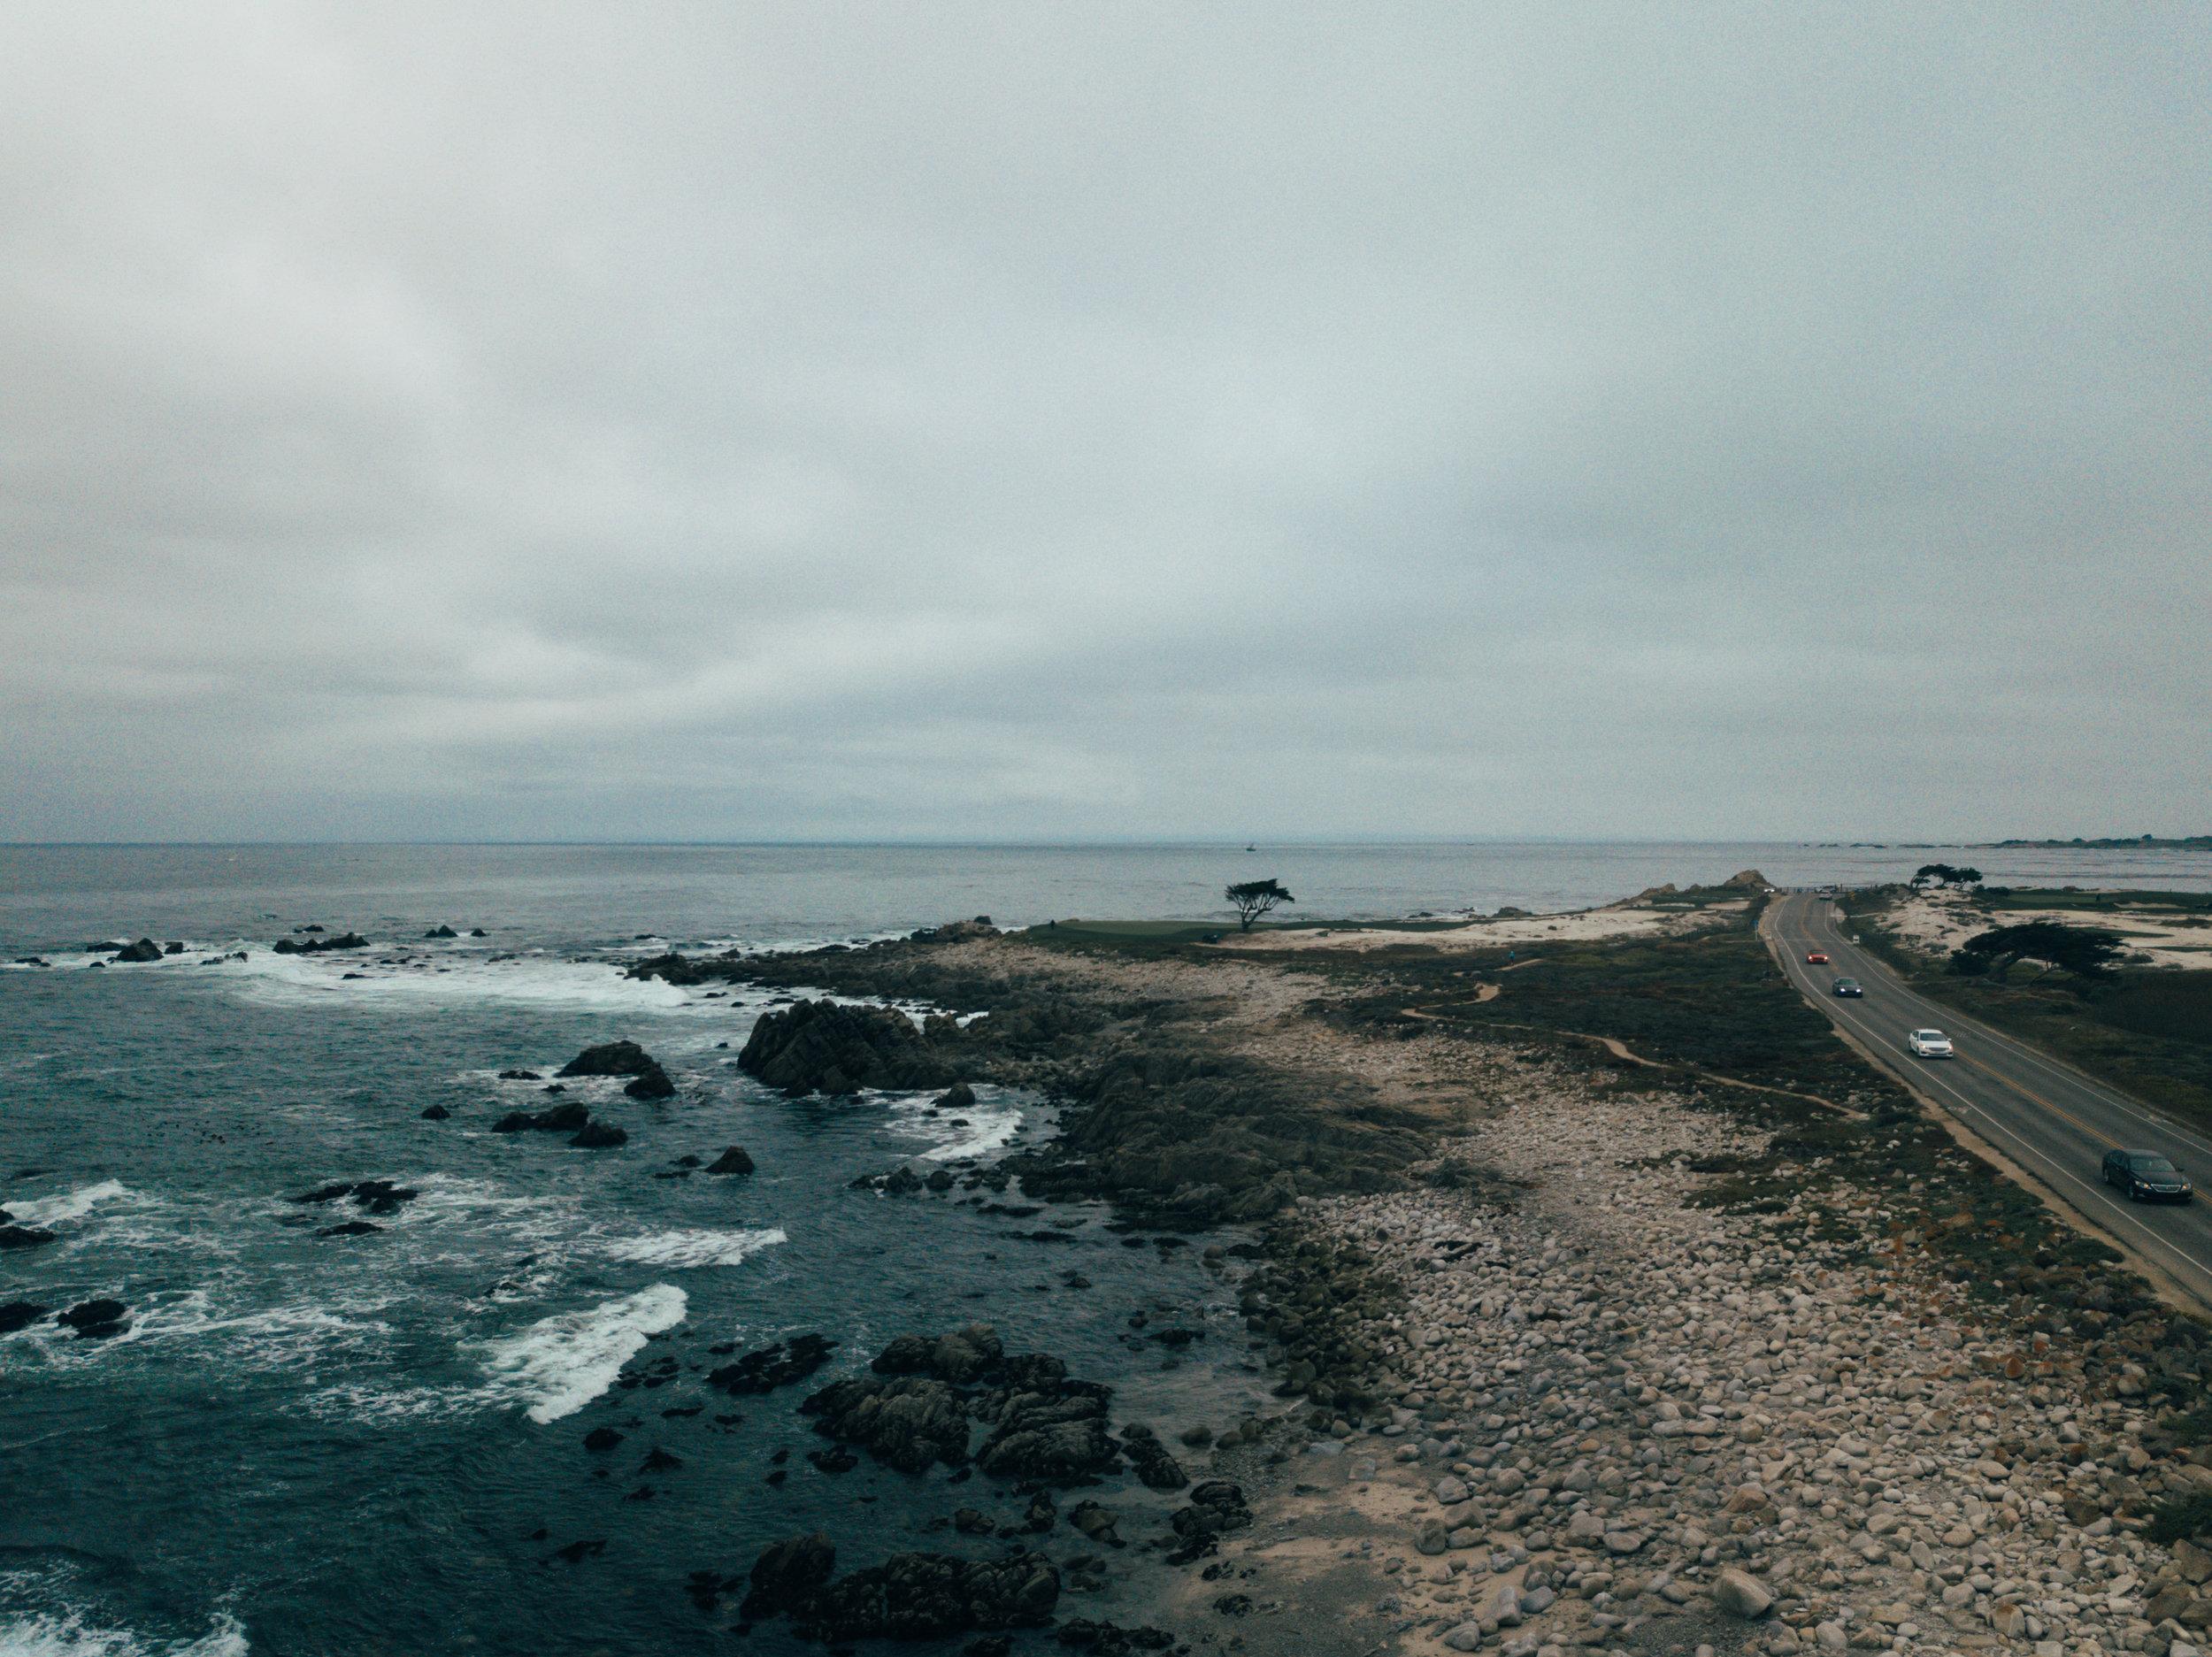 Stay_Driven_Monterey_Car_Week_Whitesse_Koenigsegg-10.jpg